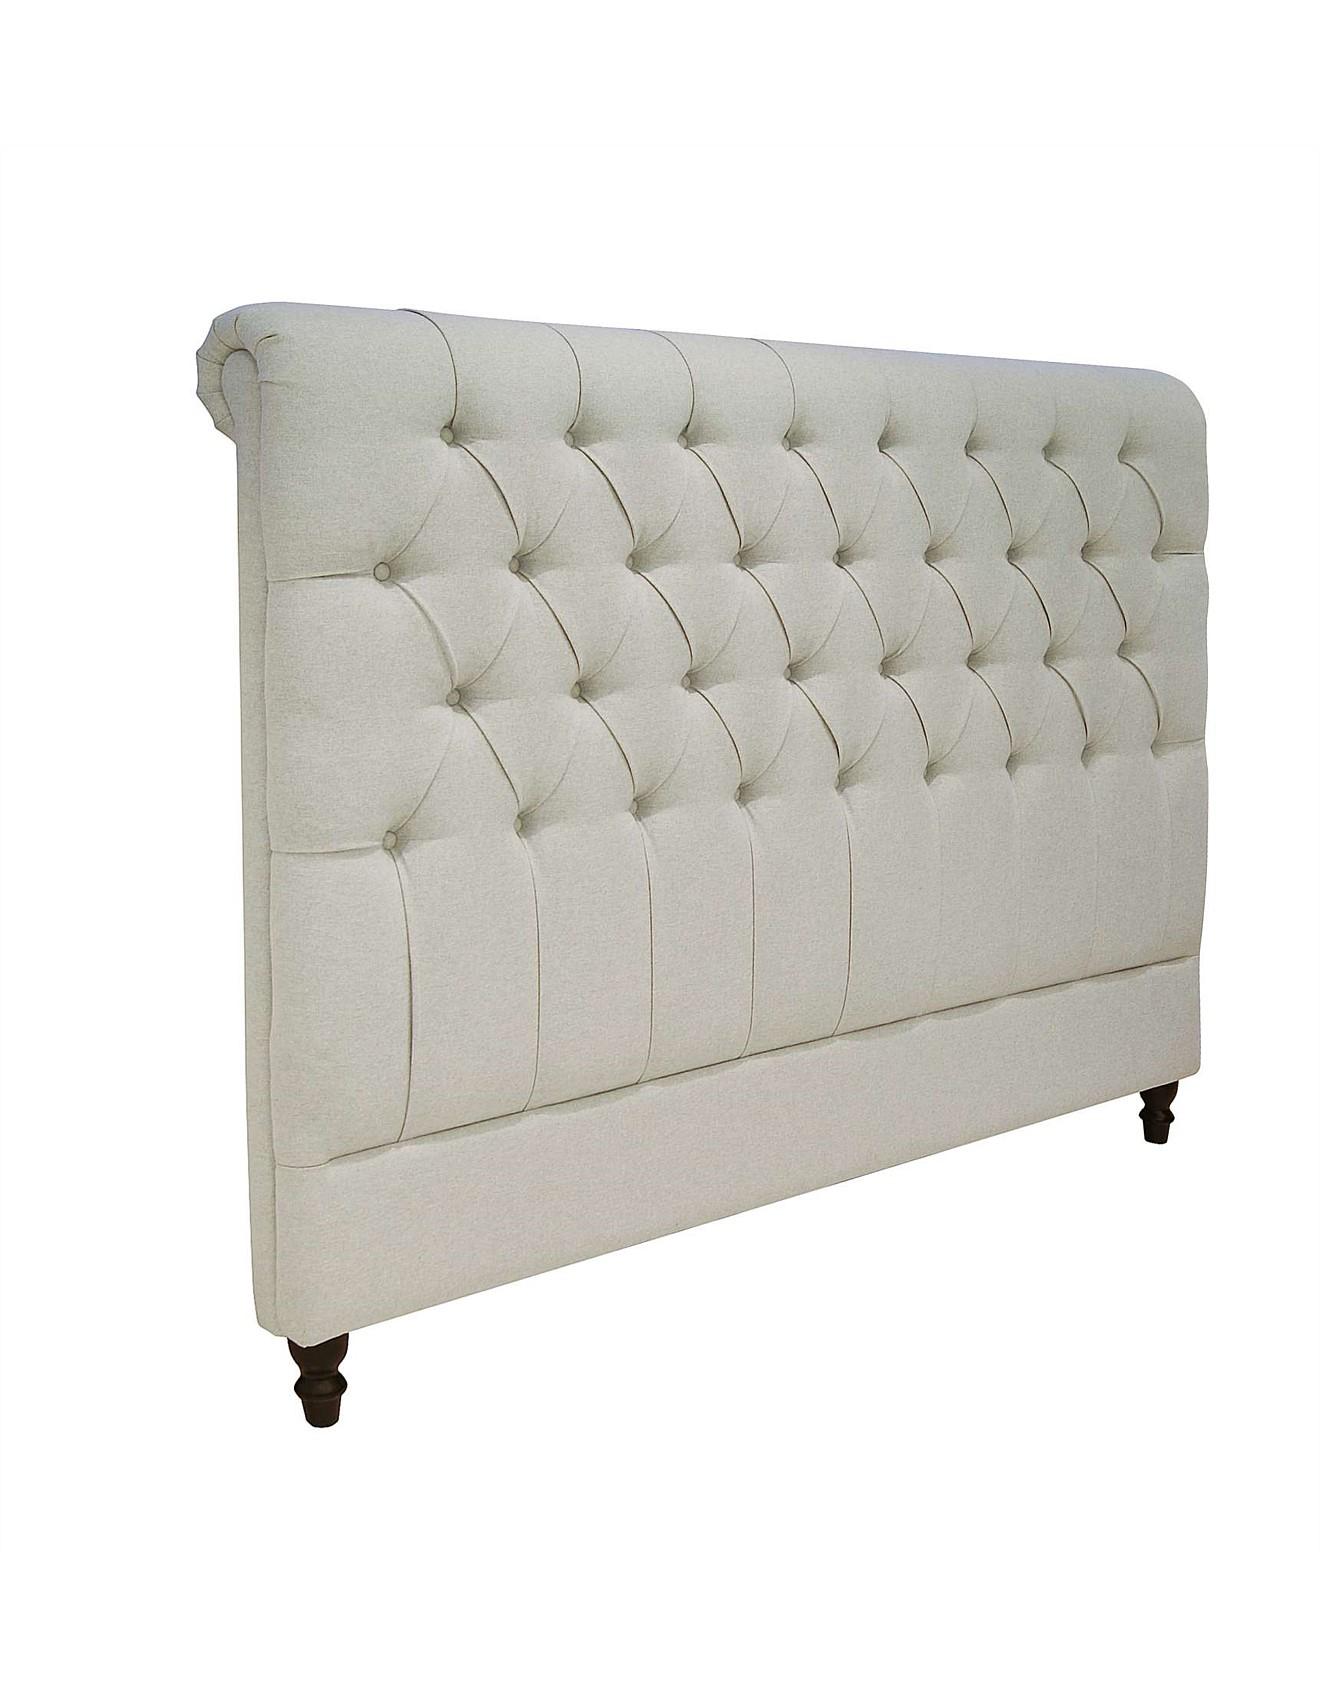 kaleigh fabric queen sleeper sofa bed travel trailer air david jones moran taraba home review